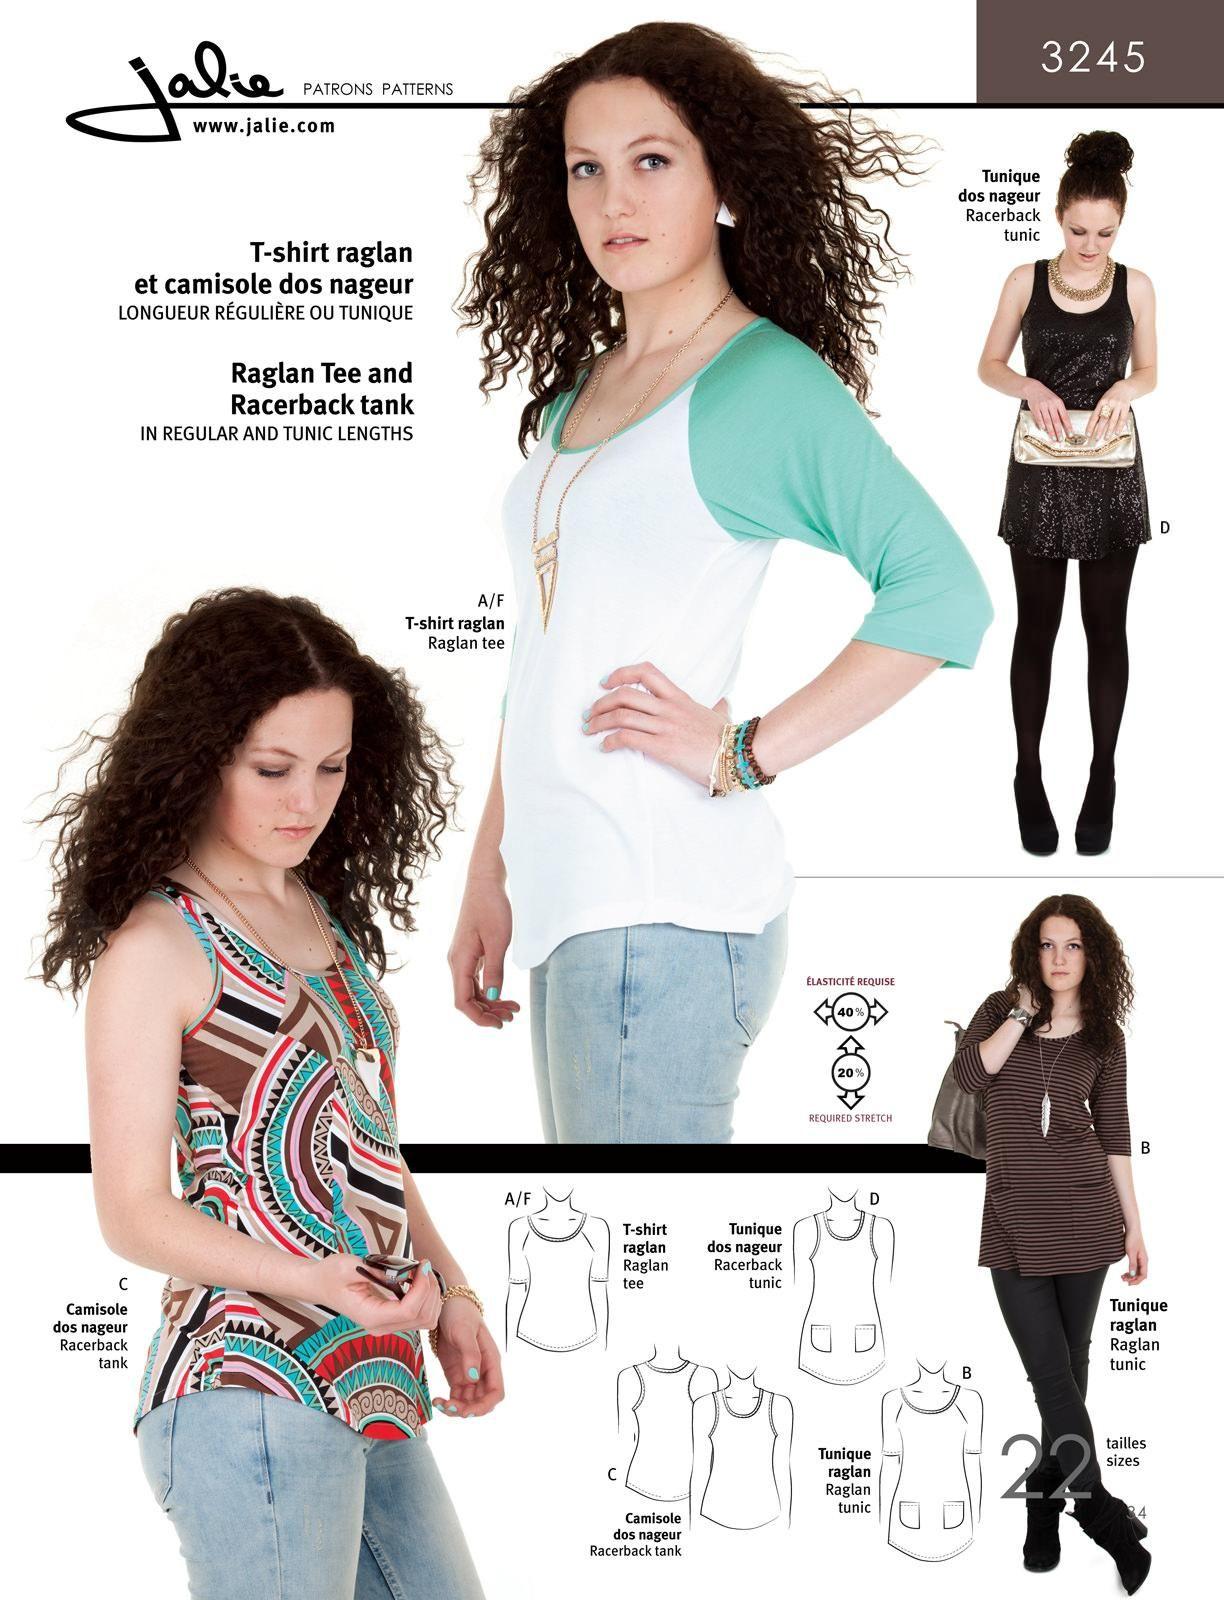 Pin de Nicole Mosher en Wish List   Pinterest   Costura y Blusas